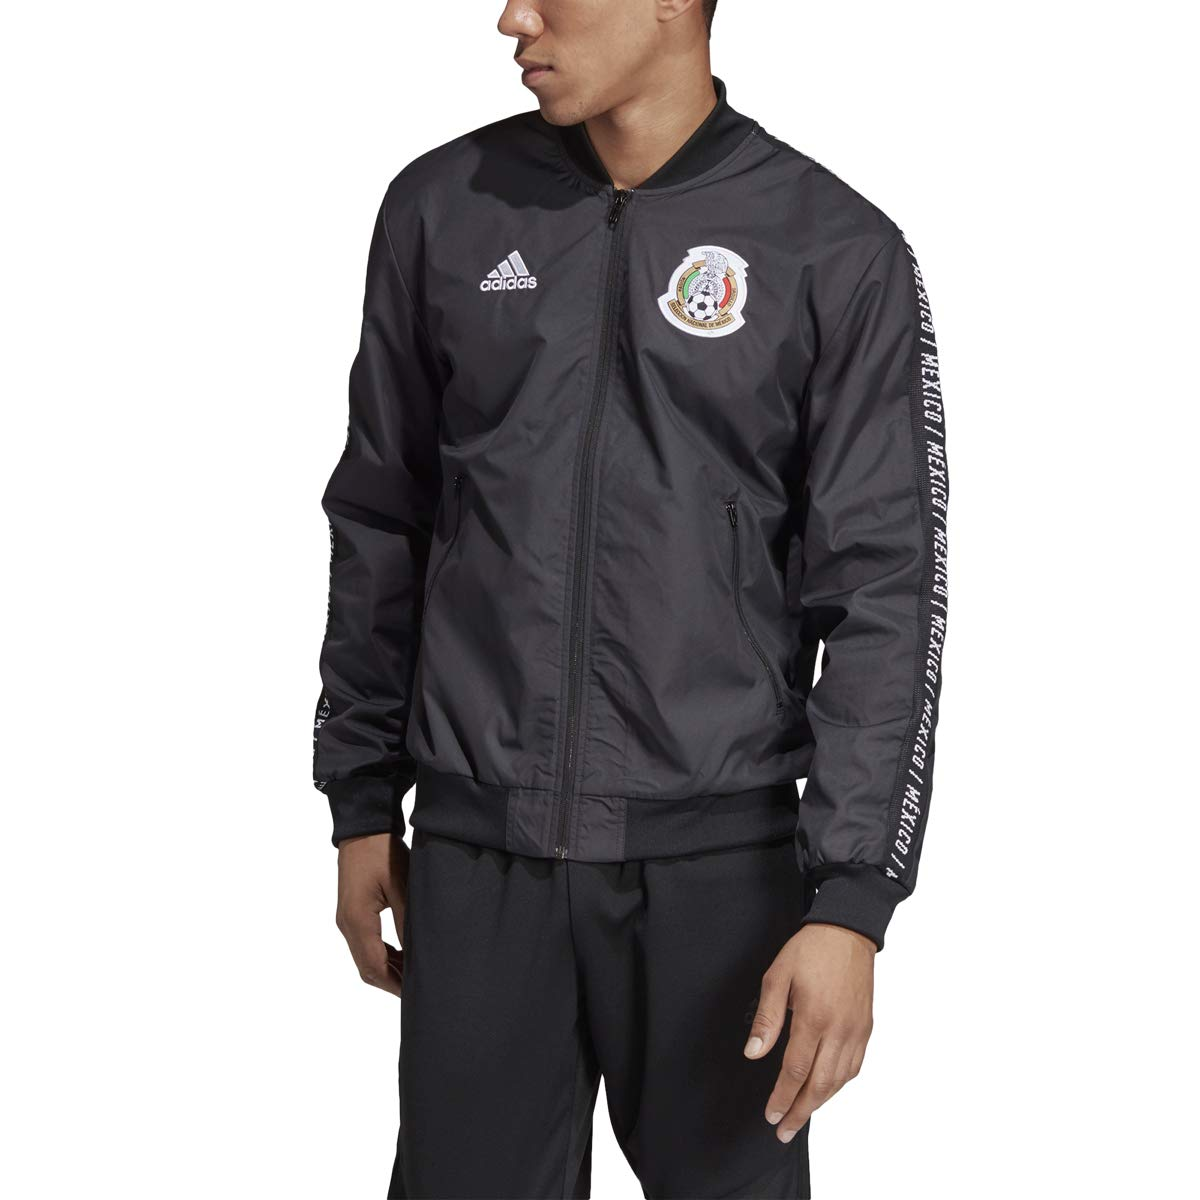 adidas Men's Soccer Mexico Anthem Jacket 2019 (S) Black/White